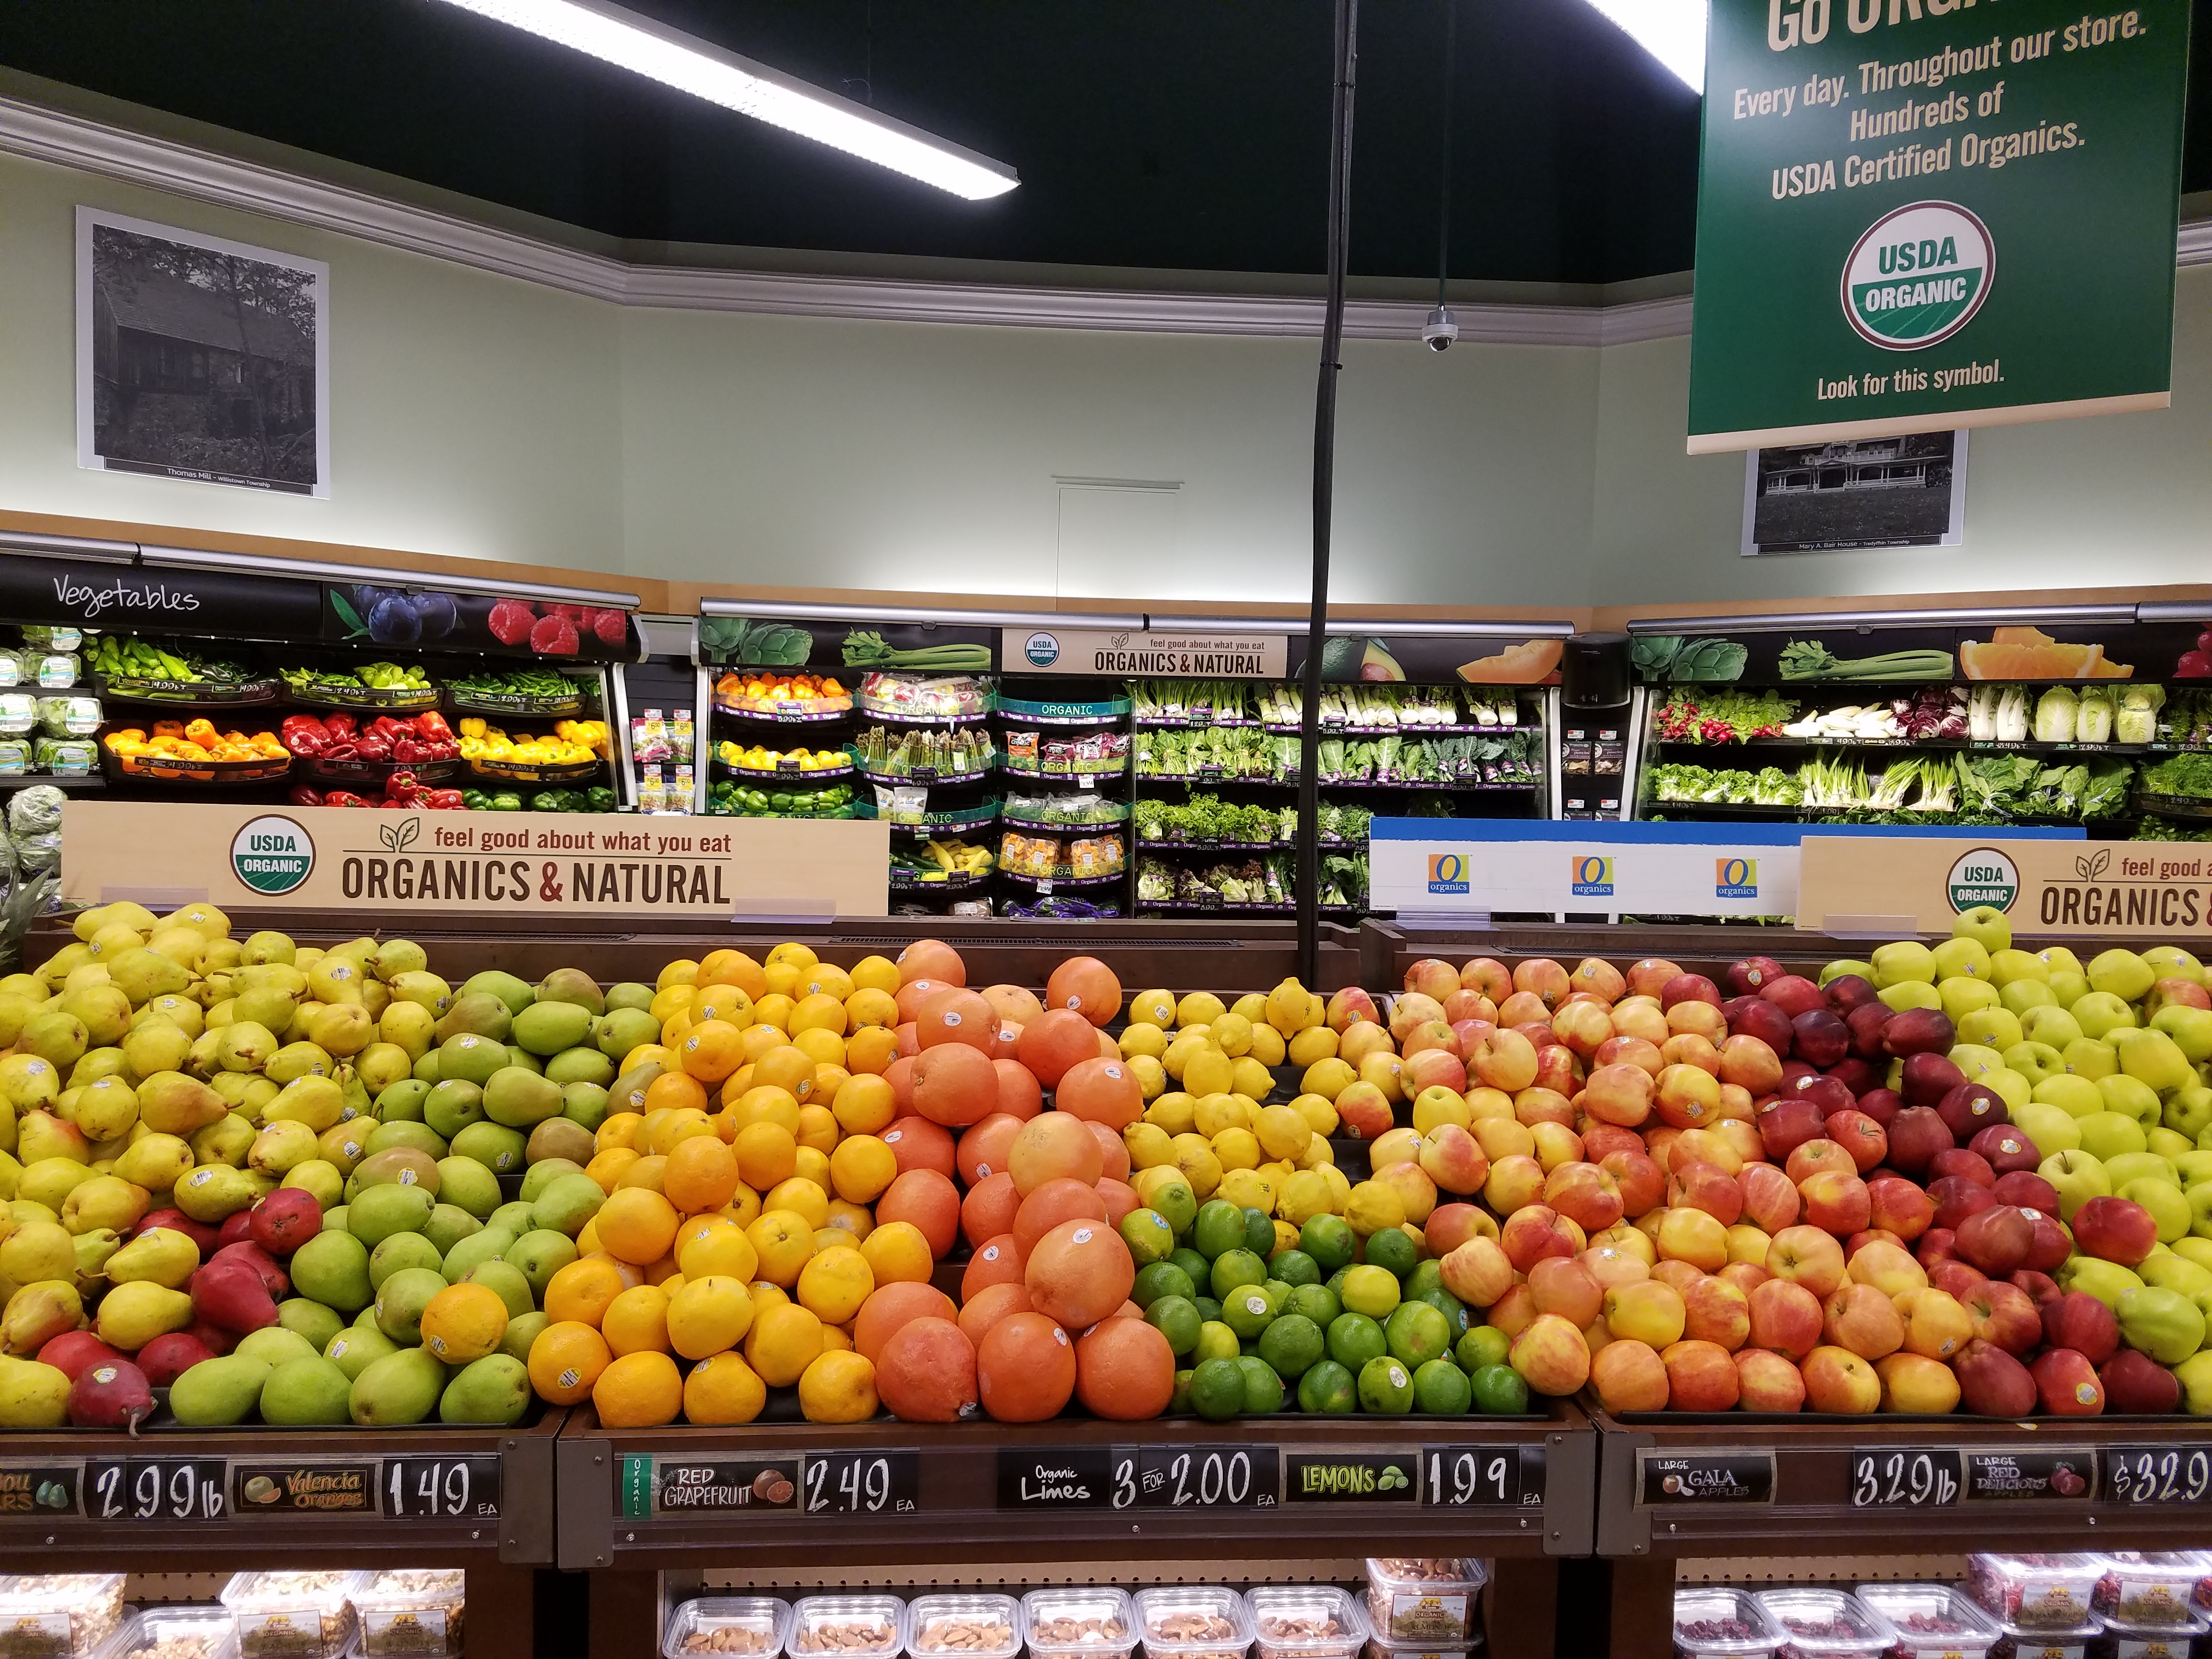 Feeling stressed or depressed; Fruit